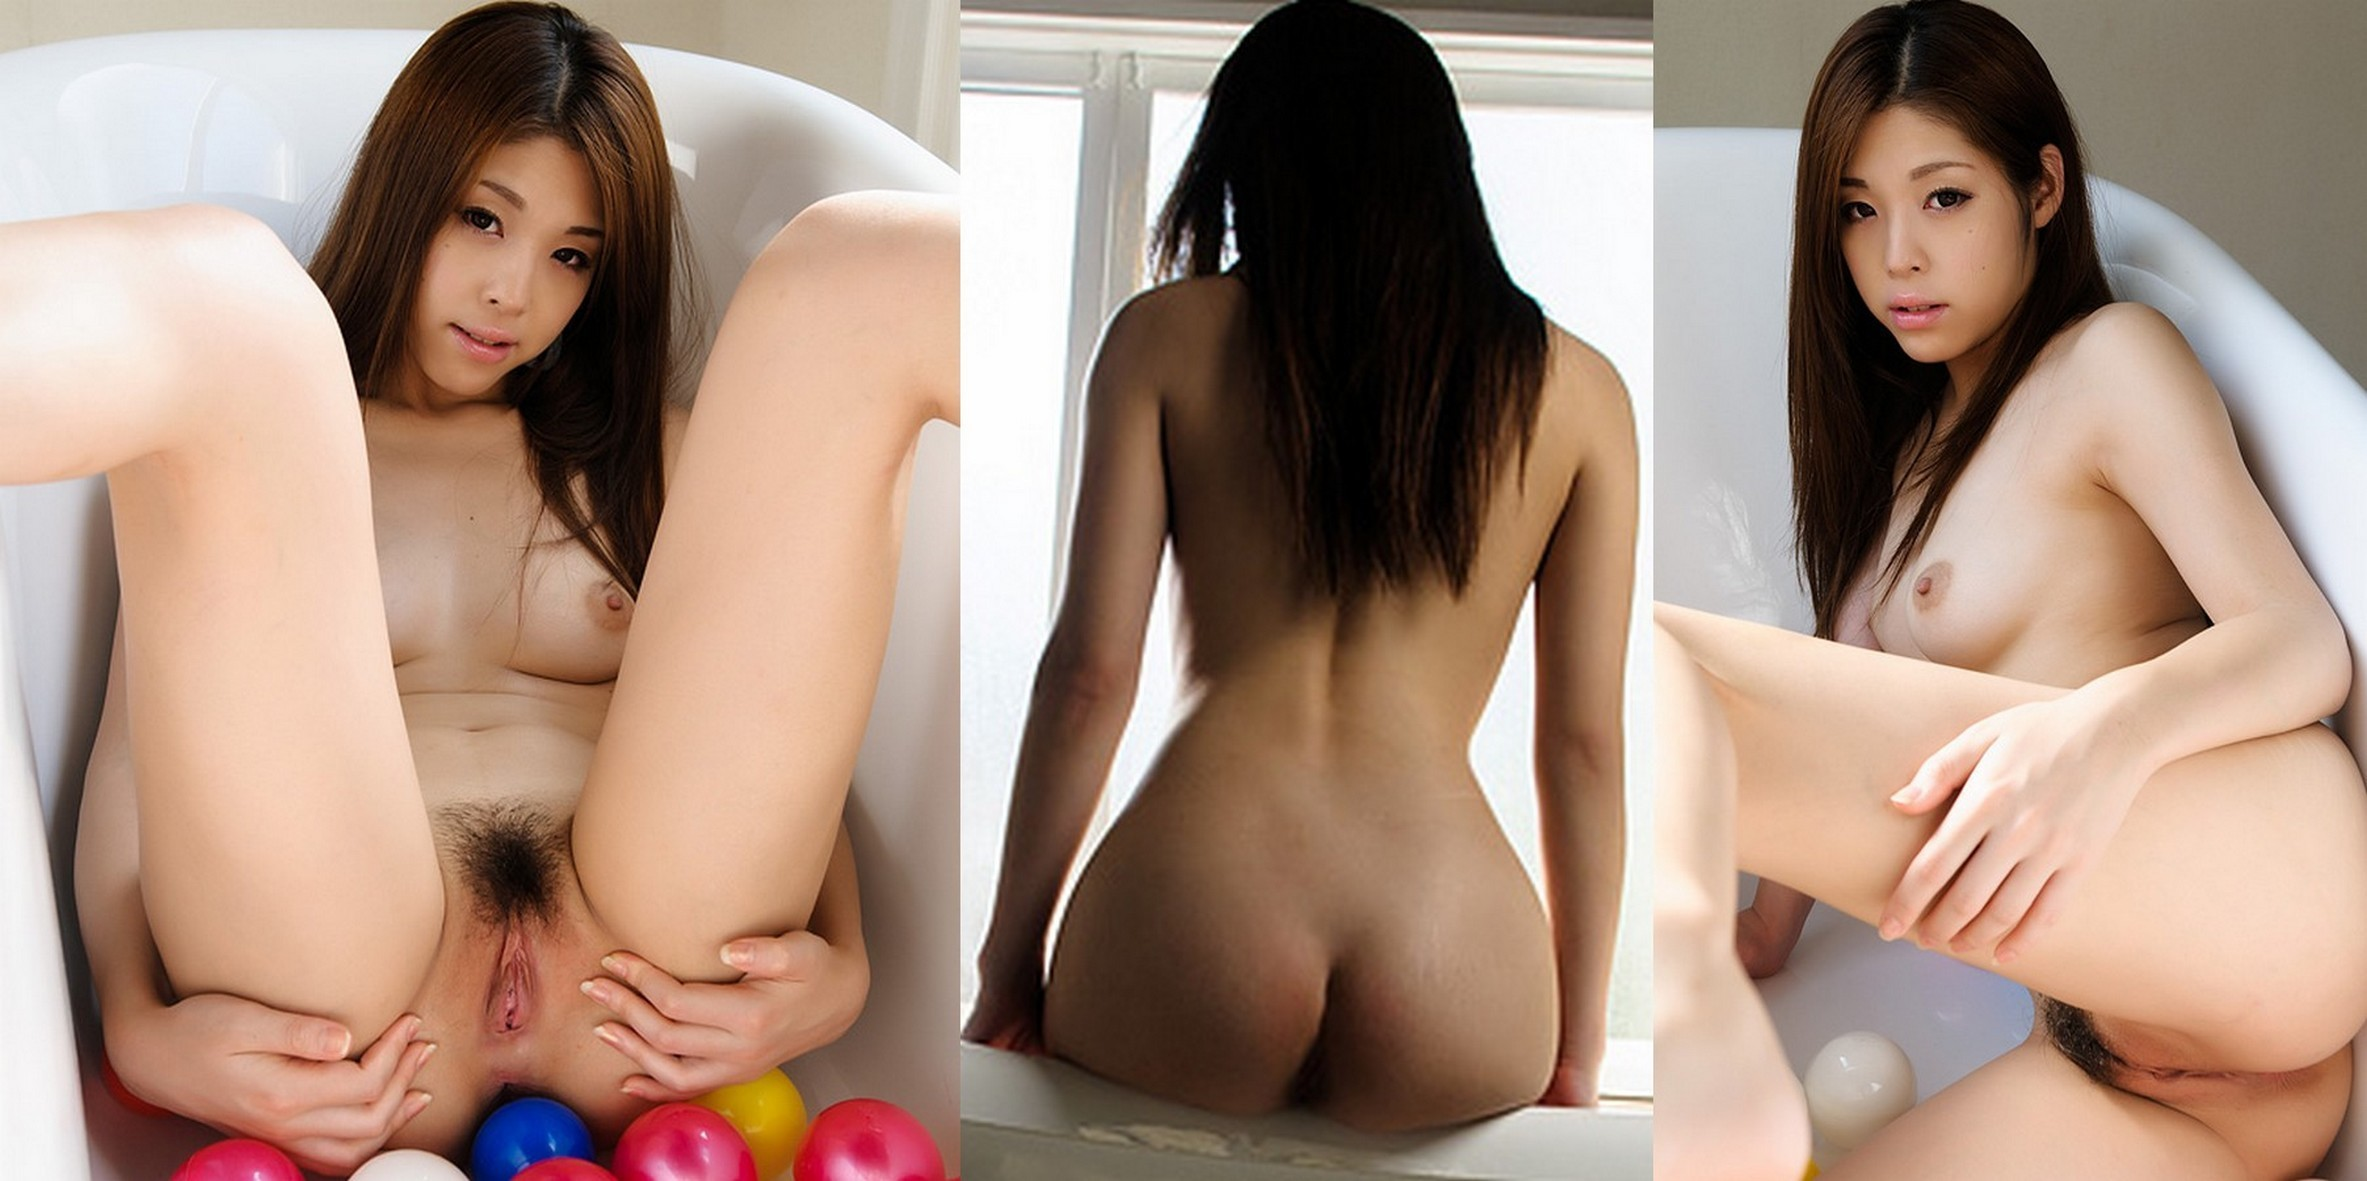 gratis escort sexdates online